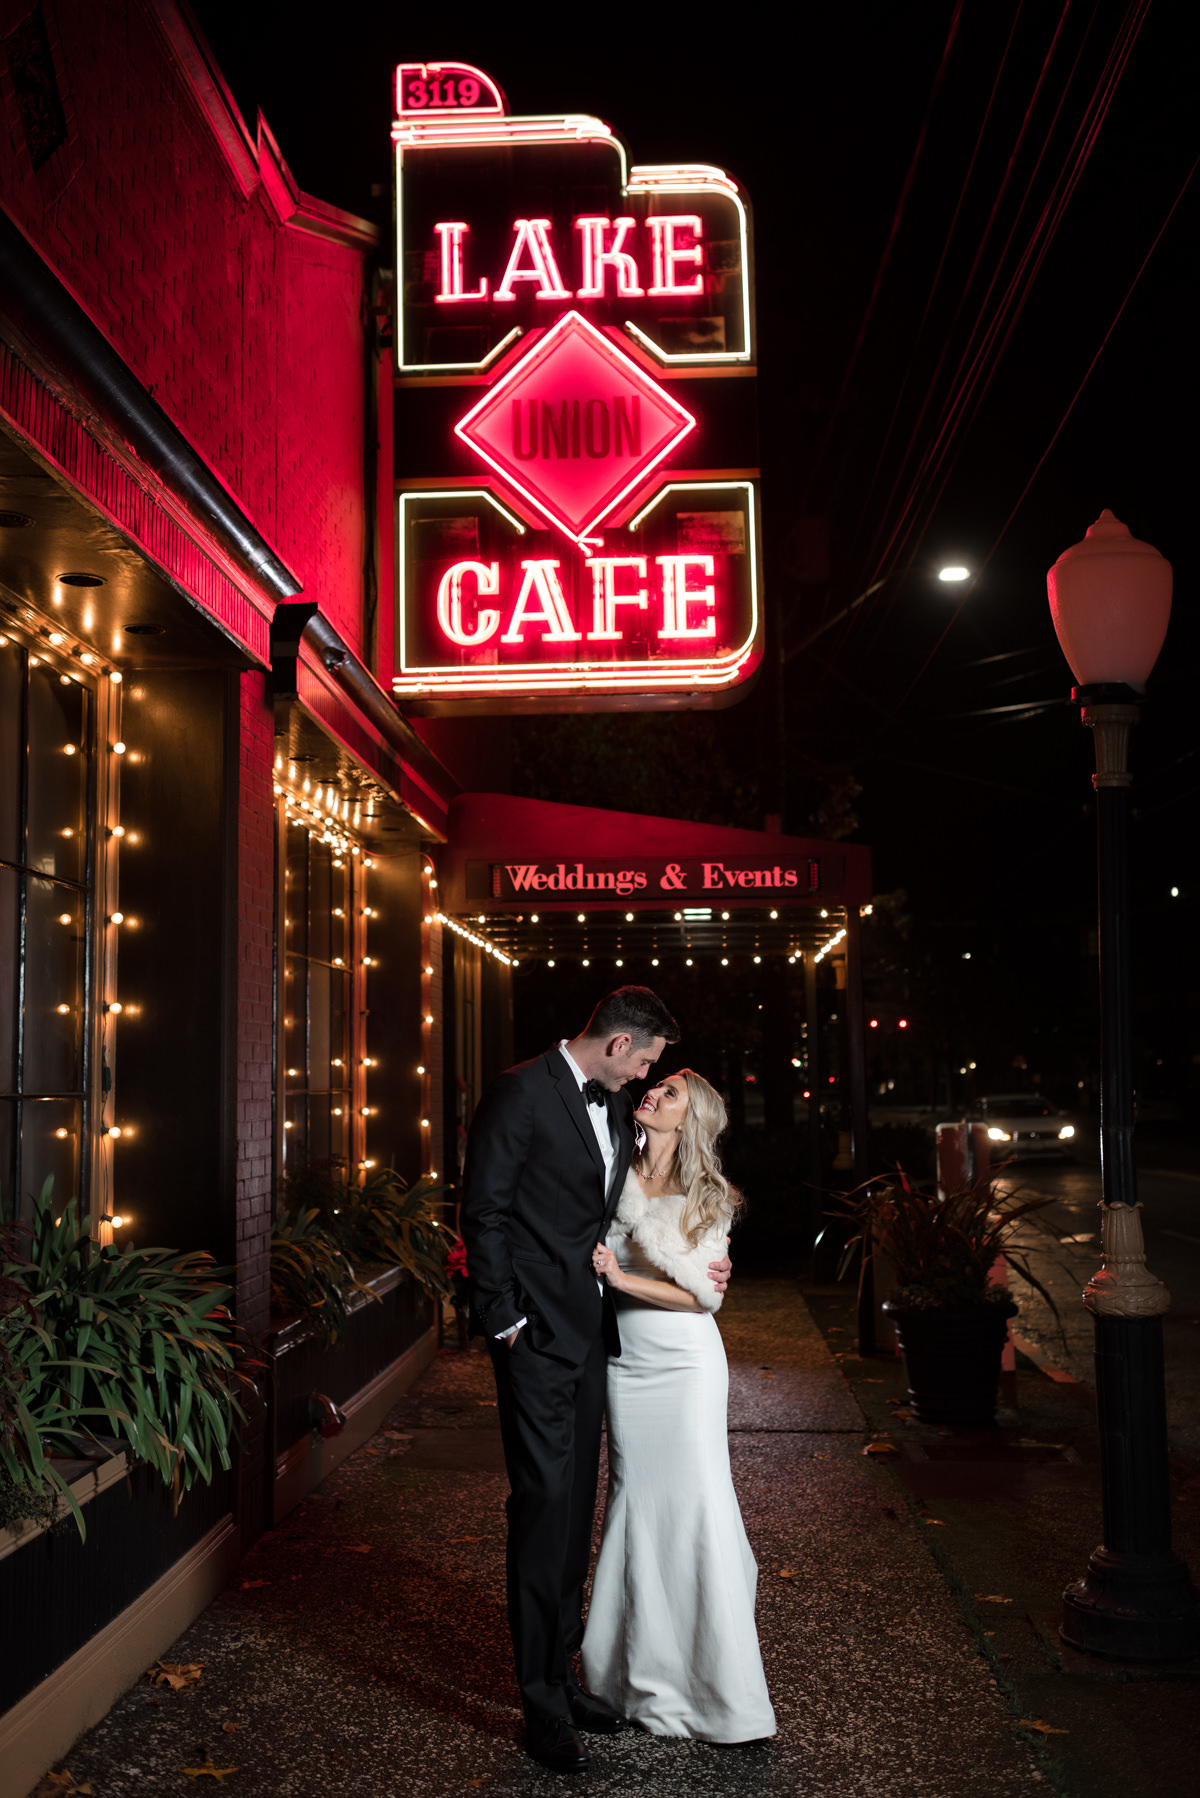 Andrew Tat - Documentary Wedding Photography - Lake Union Cafe - Seattle, Washington -Rachel and Ryan - 56.jpg